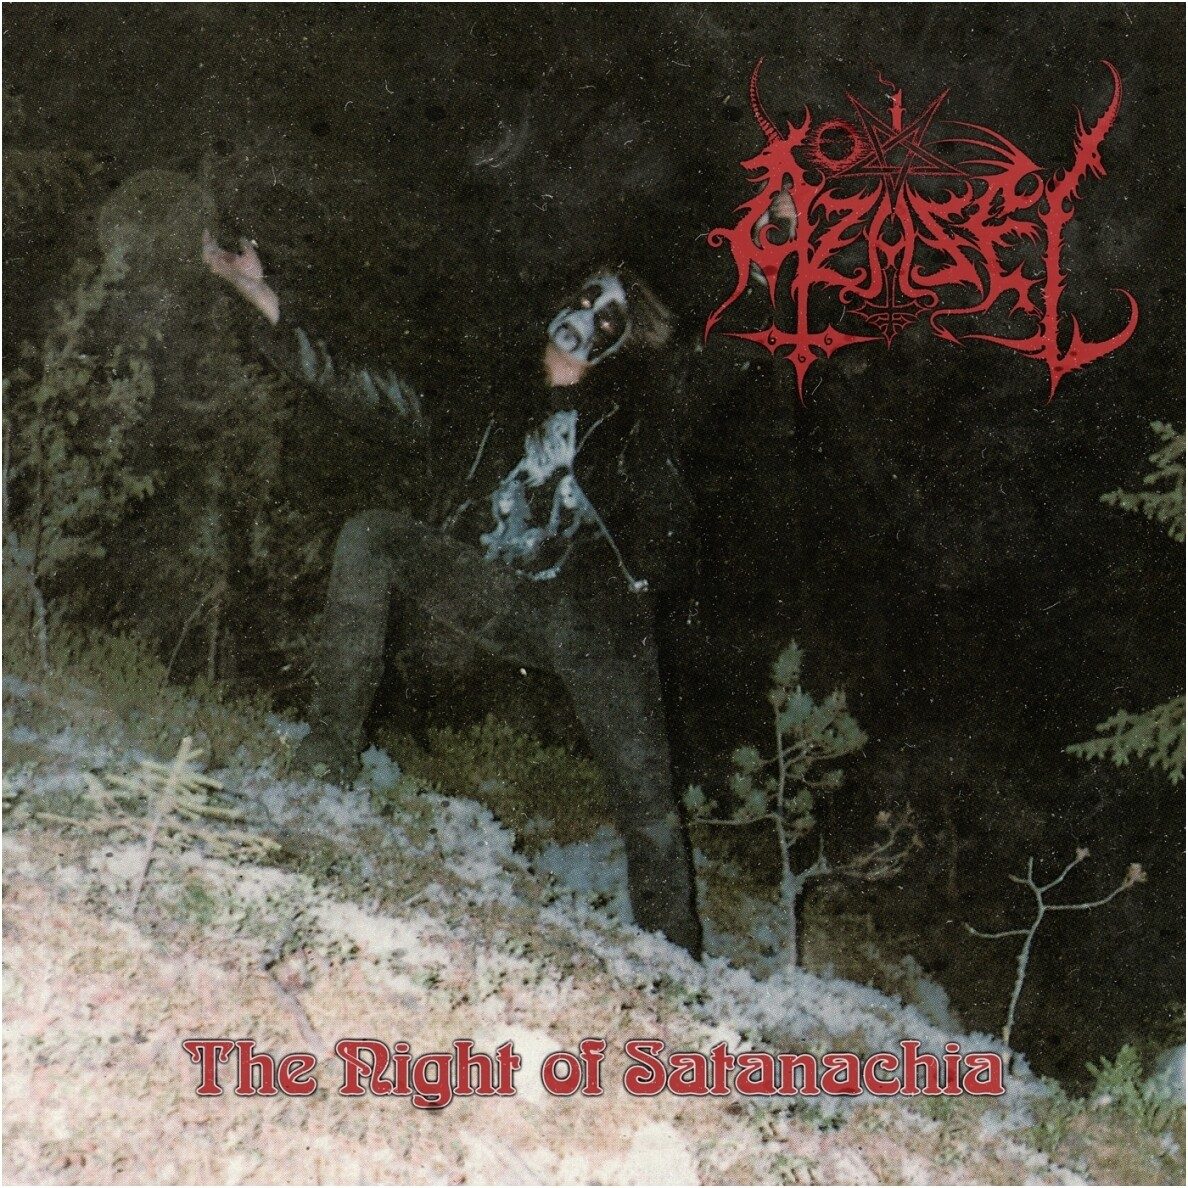 Azazel - The Night Of Satanachia LP *Pre Order*